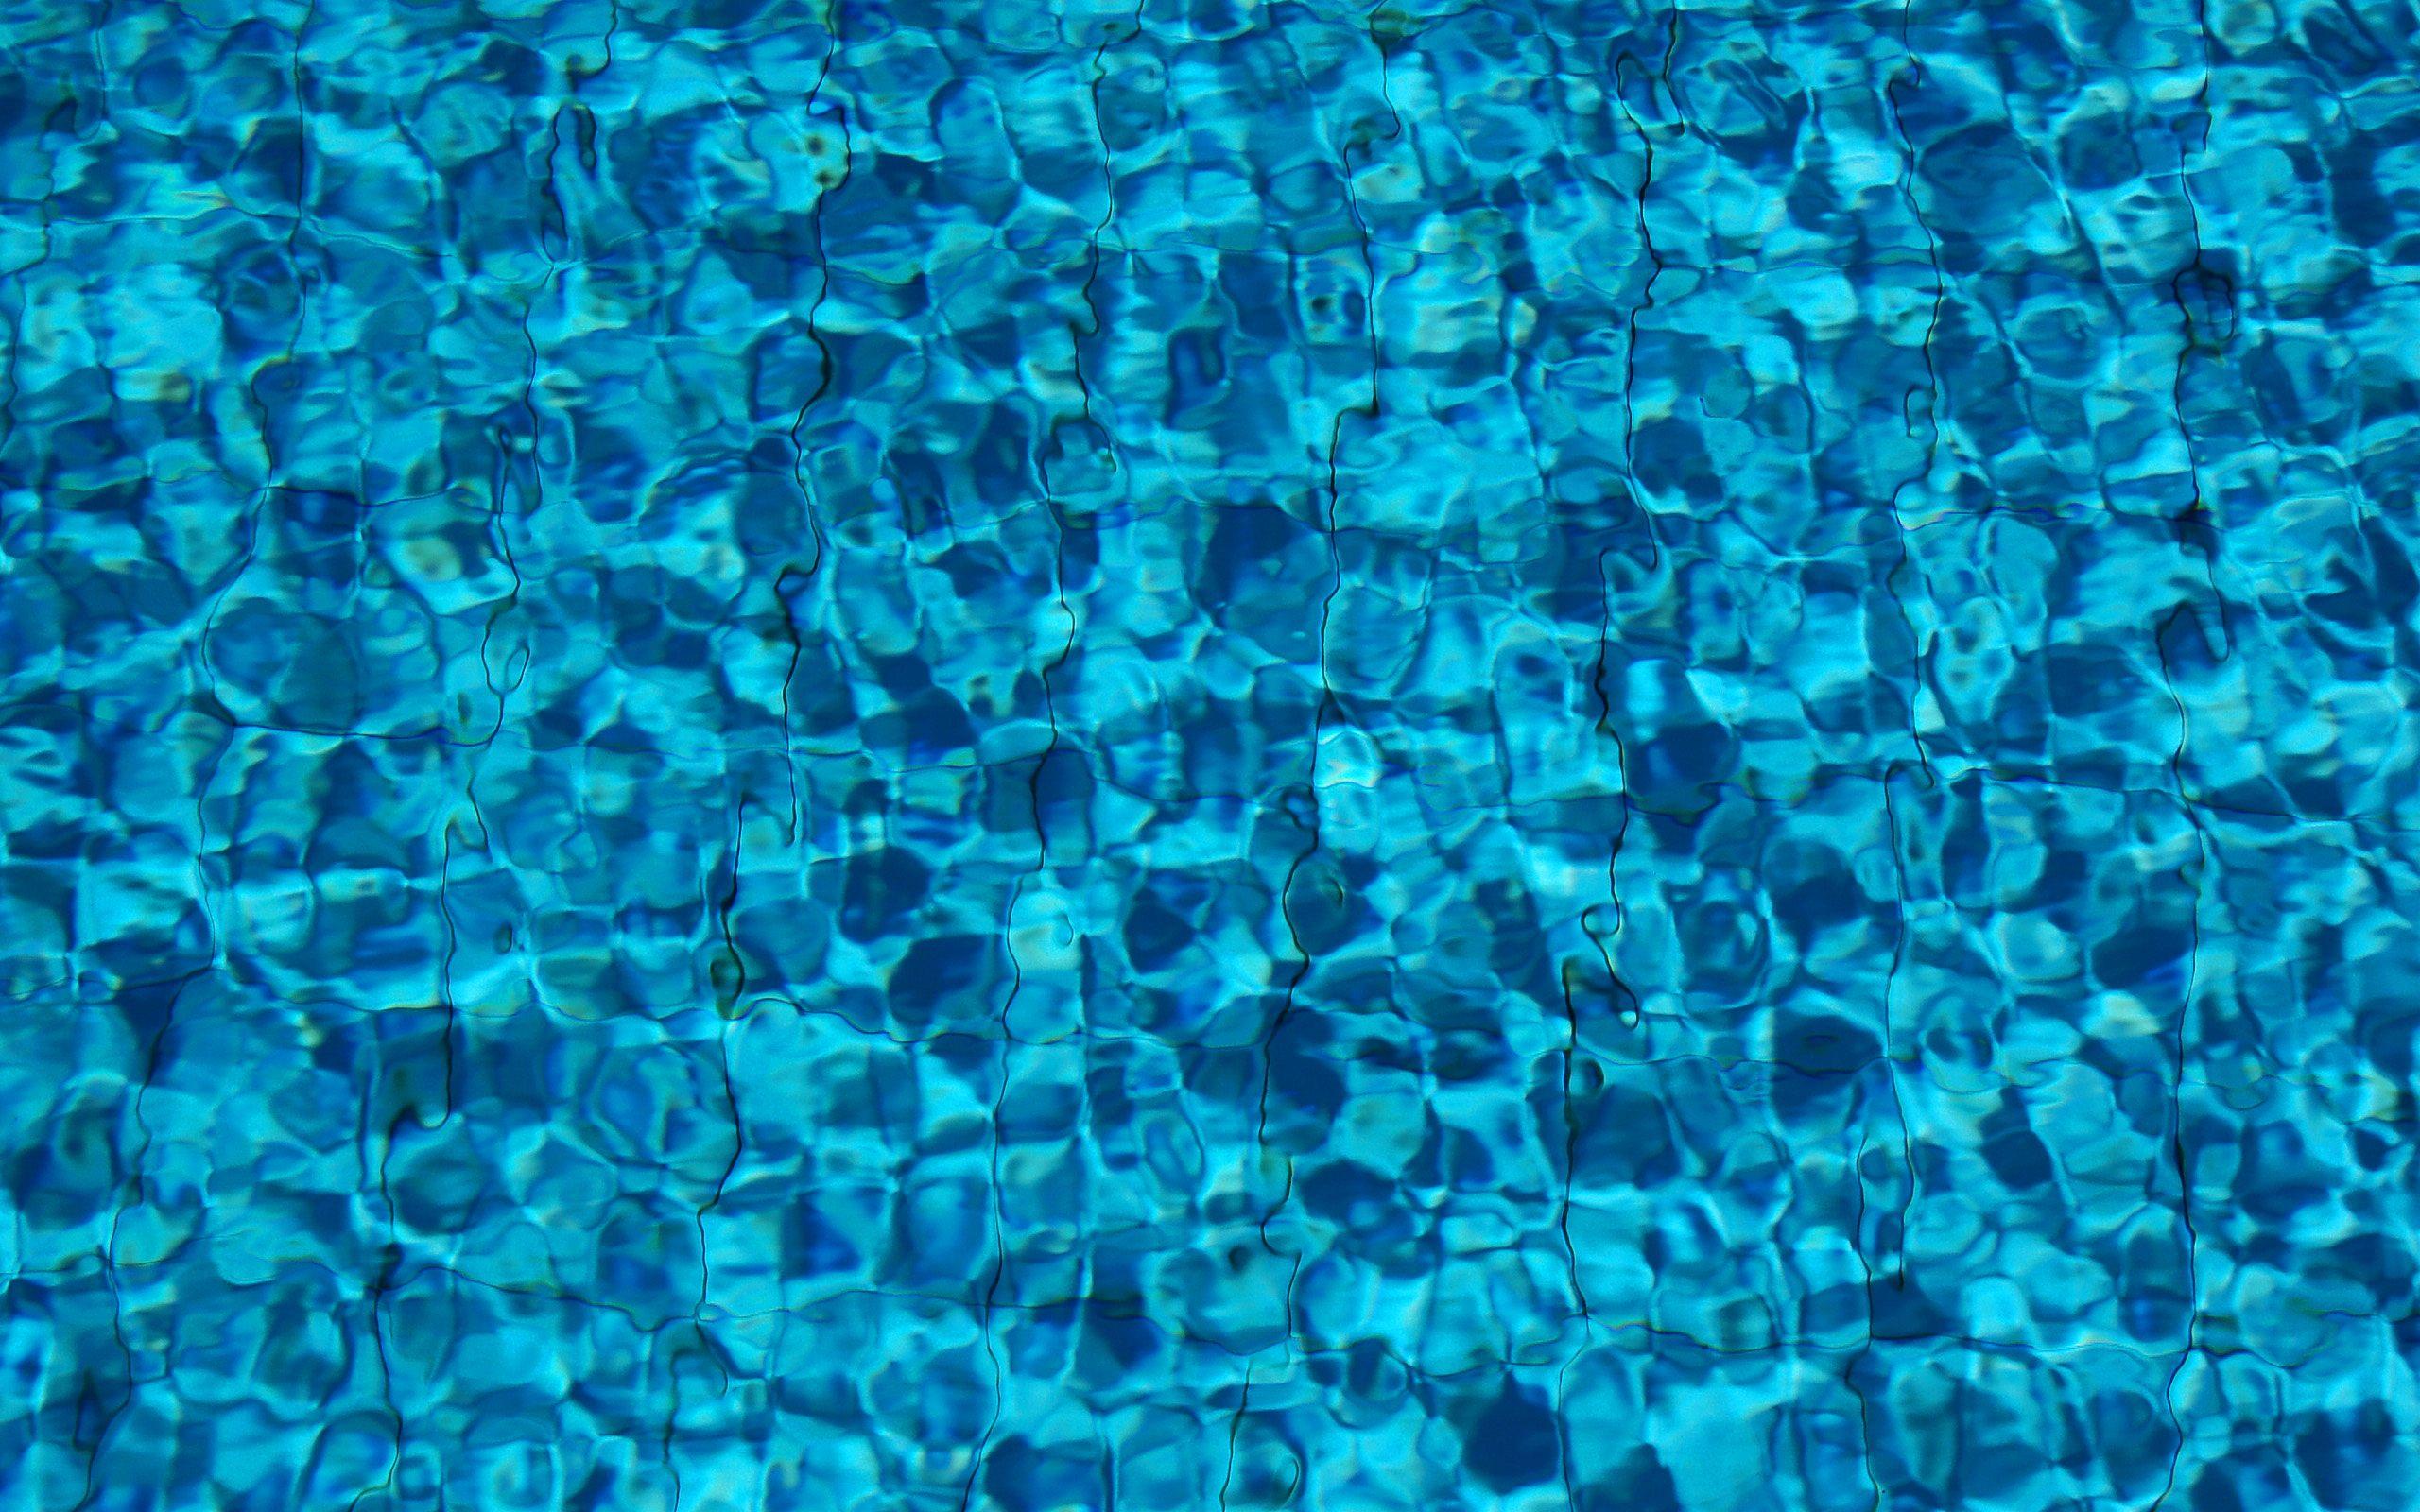 Water full hd wallpaper and background image 2560x1600 - Aquatic wallpaper ...